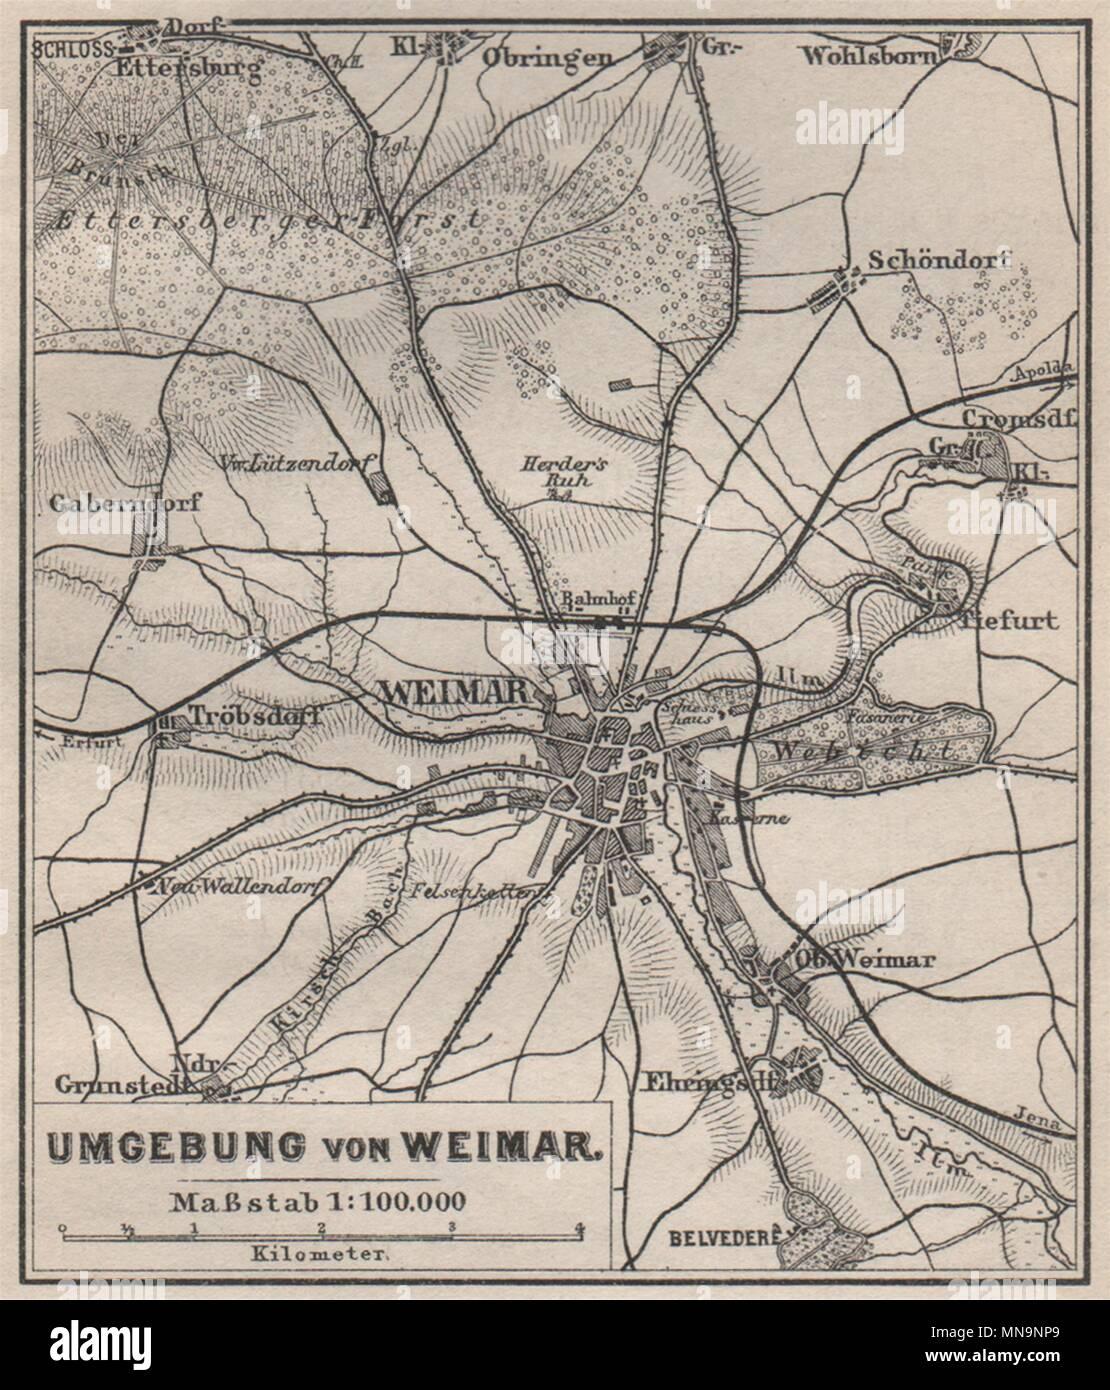 Karte Weimar Und Umgebung.Weimar Umgebung Environs Thuringia Karte Baedeker Small